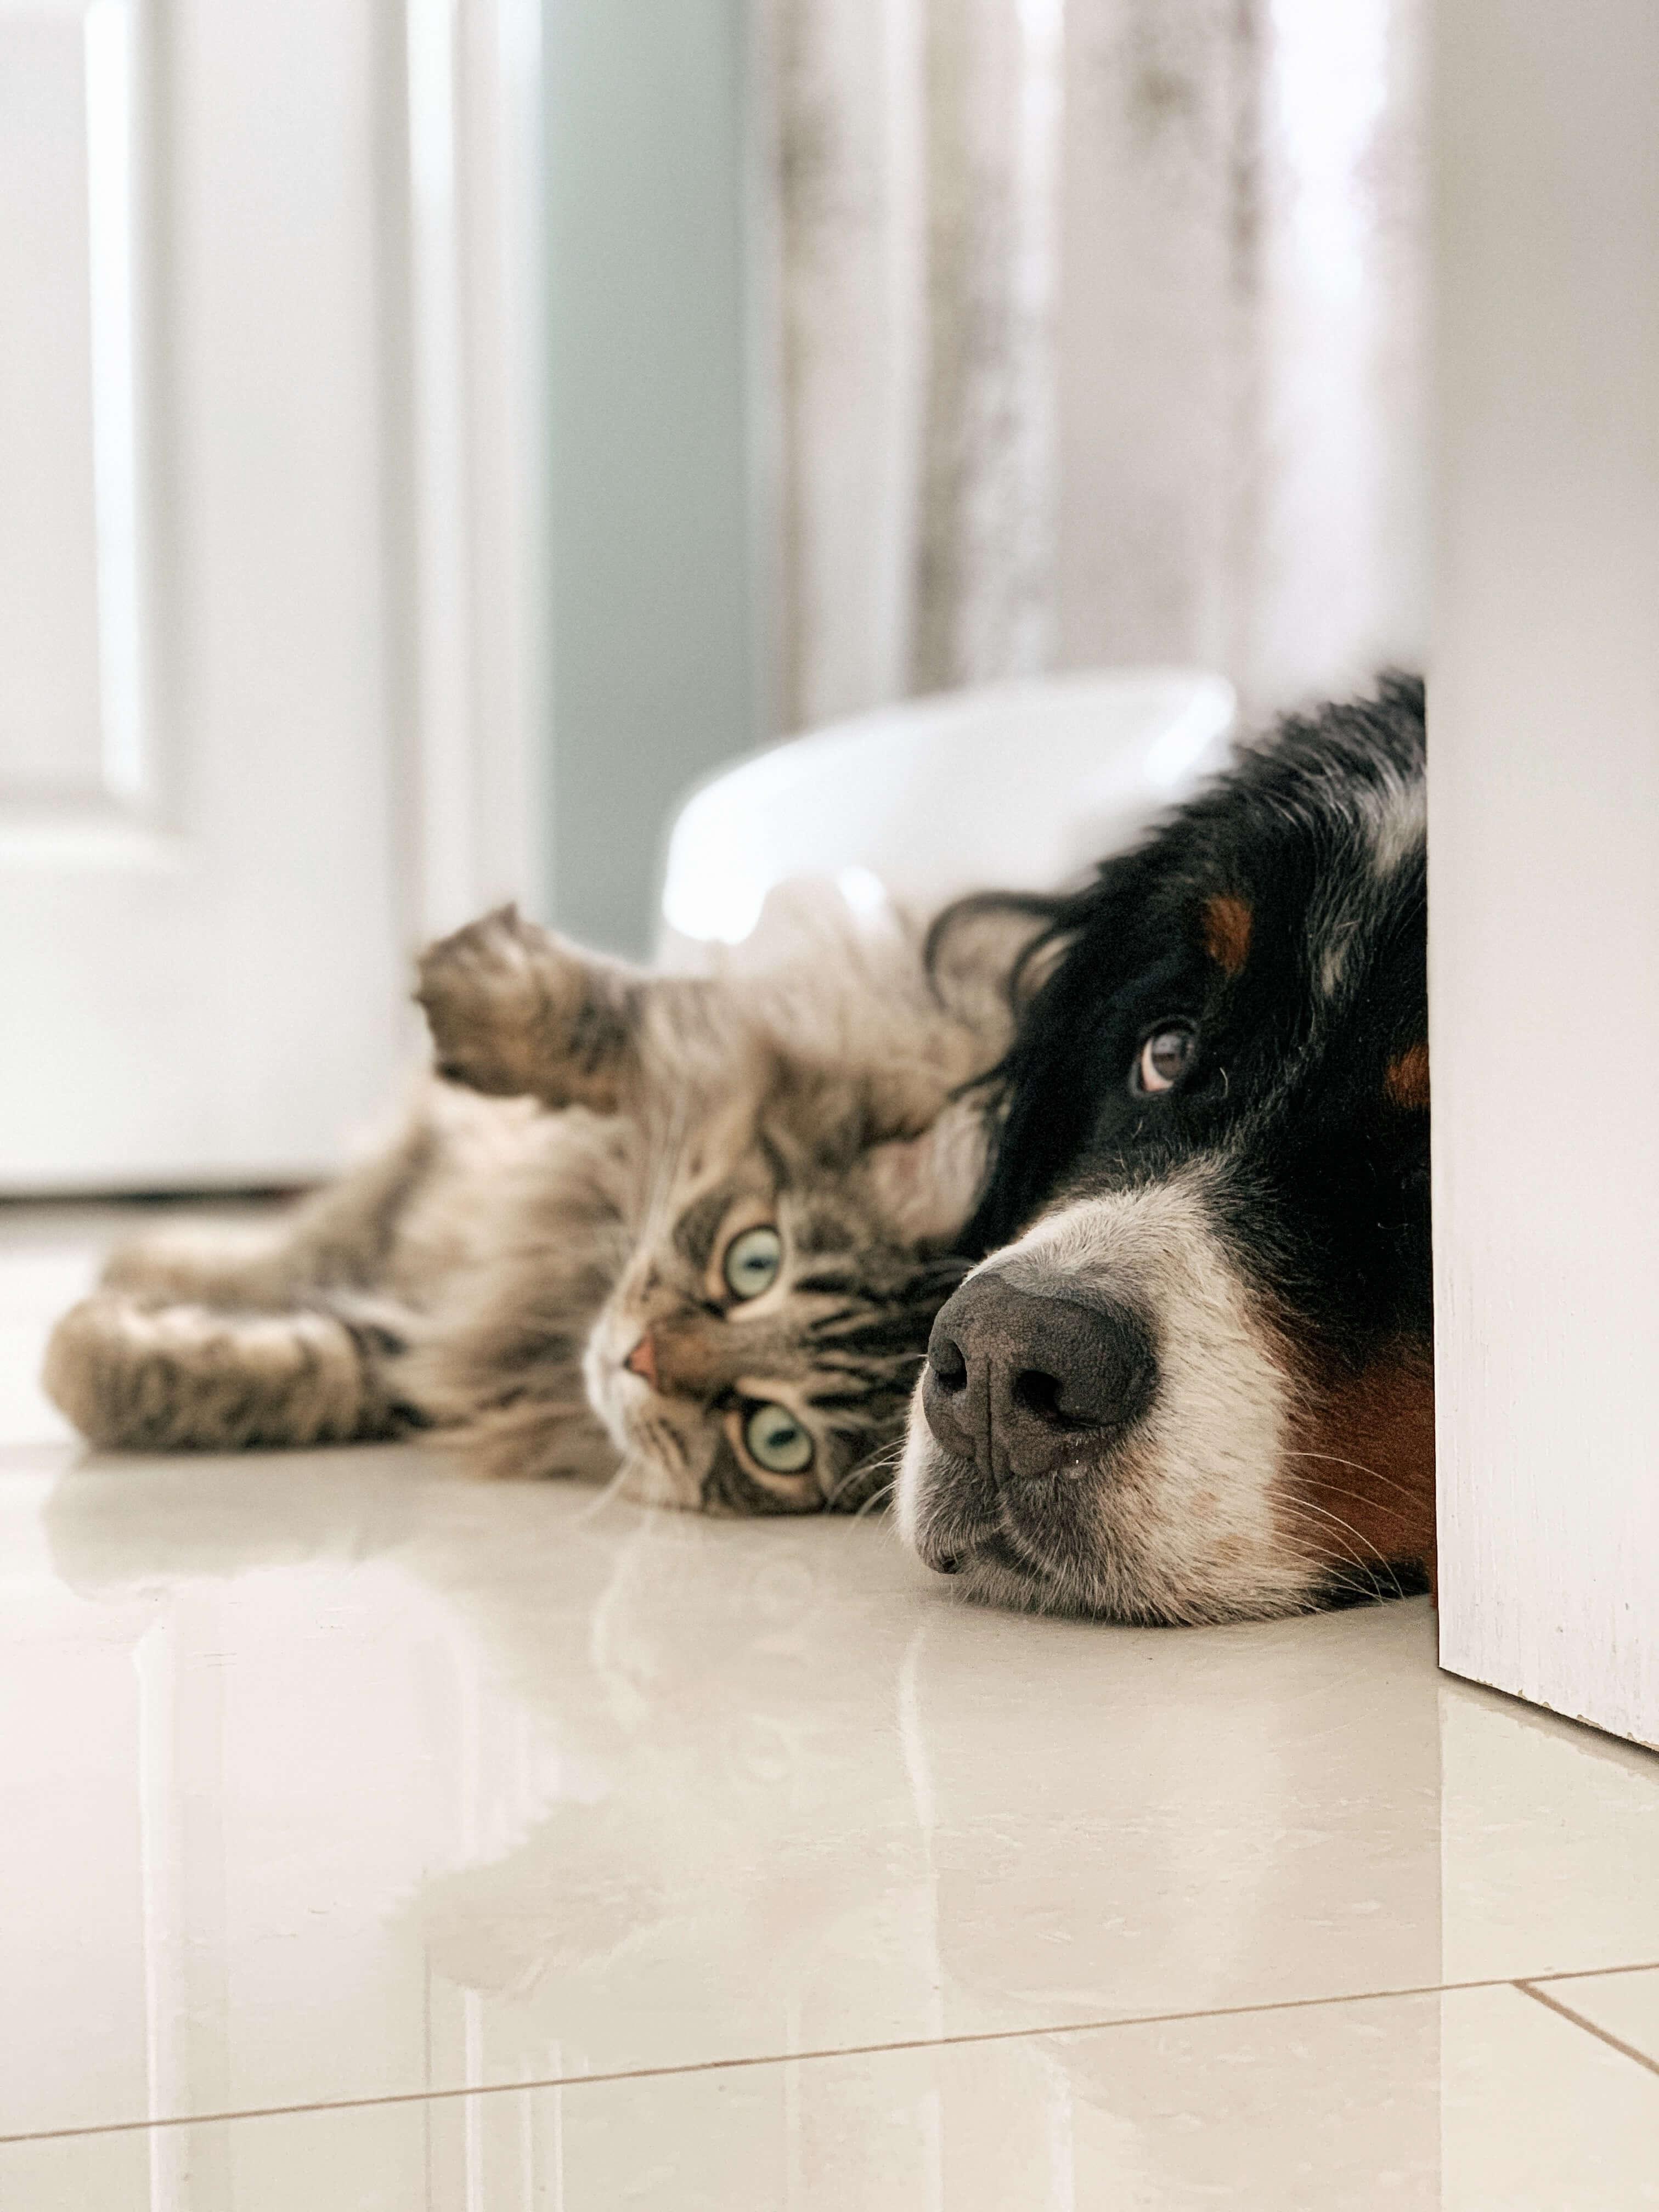 Pet Friendly apartments in Wichita